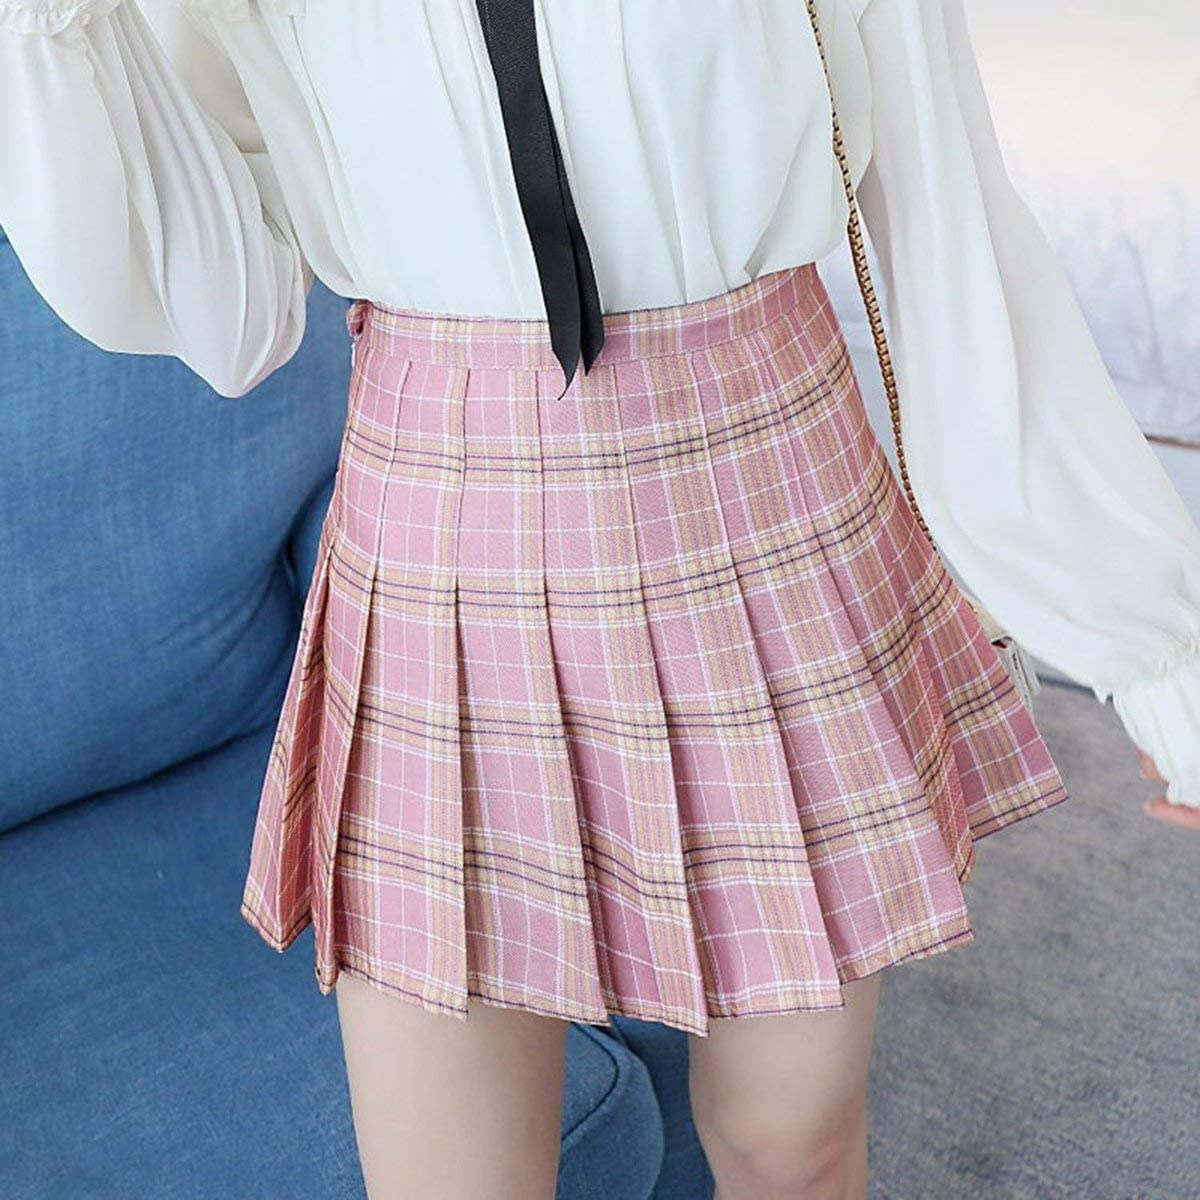 Greatangle Moda Primavera Verano para Mujer Falda de Cintura Alta Slim Comfort Lattice Plisado Skater Tennis School Falda Mini Vestido